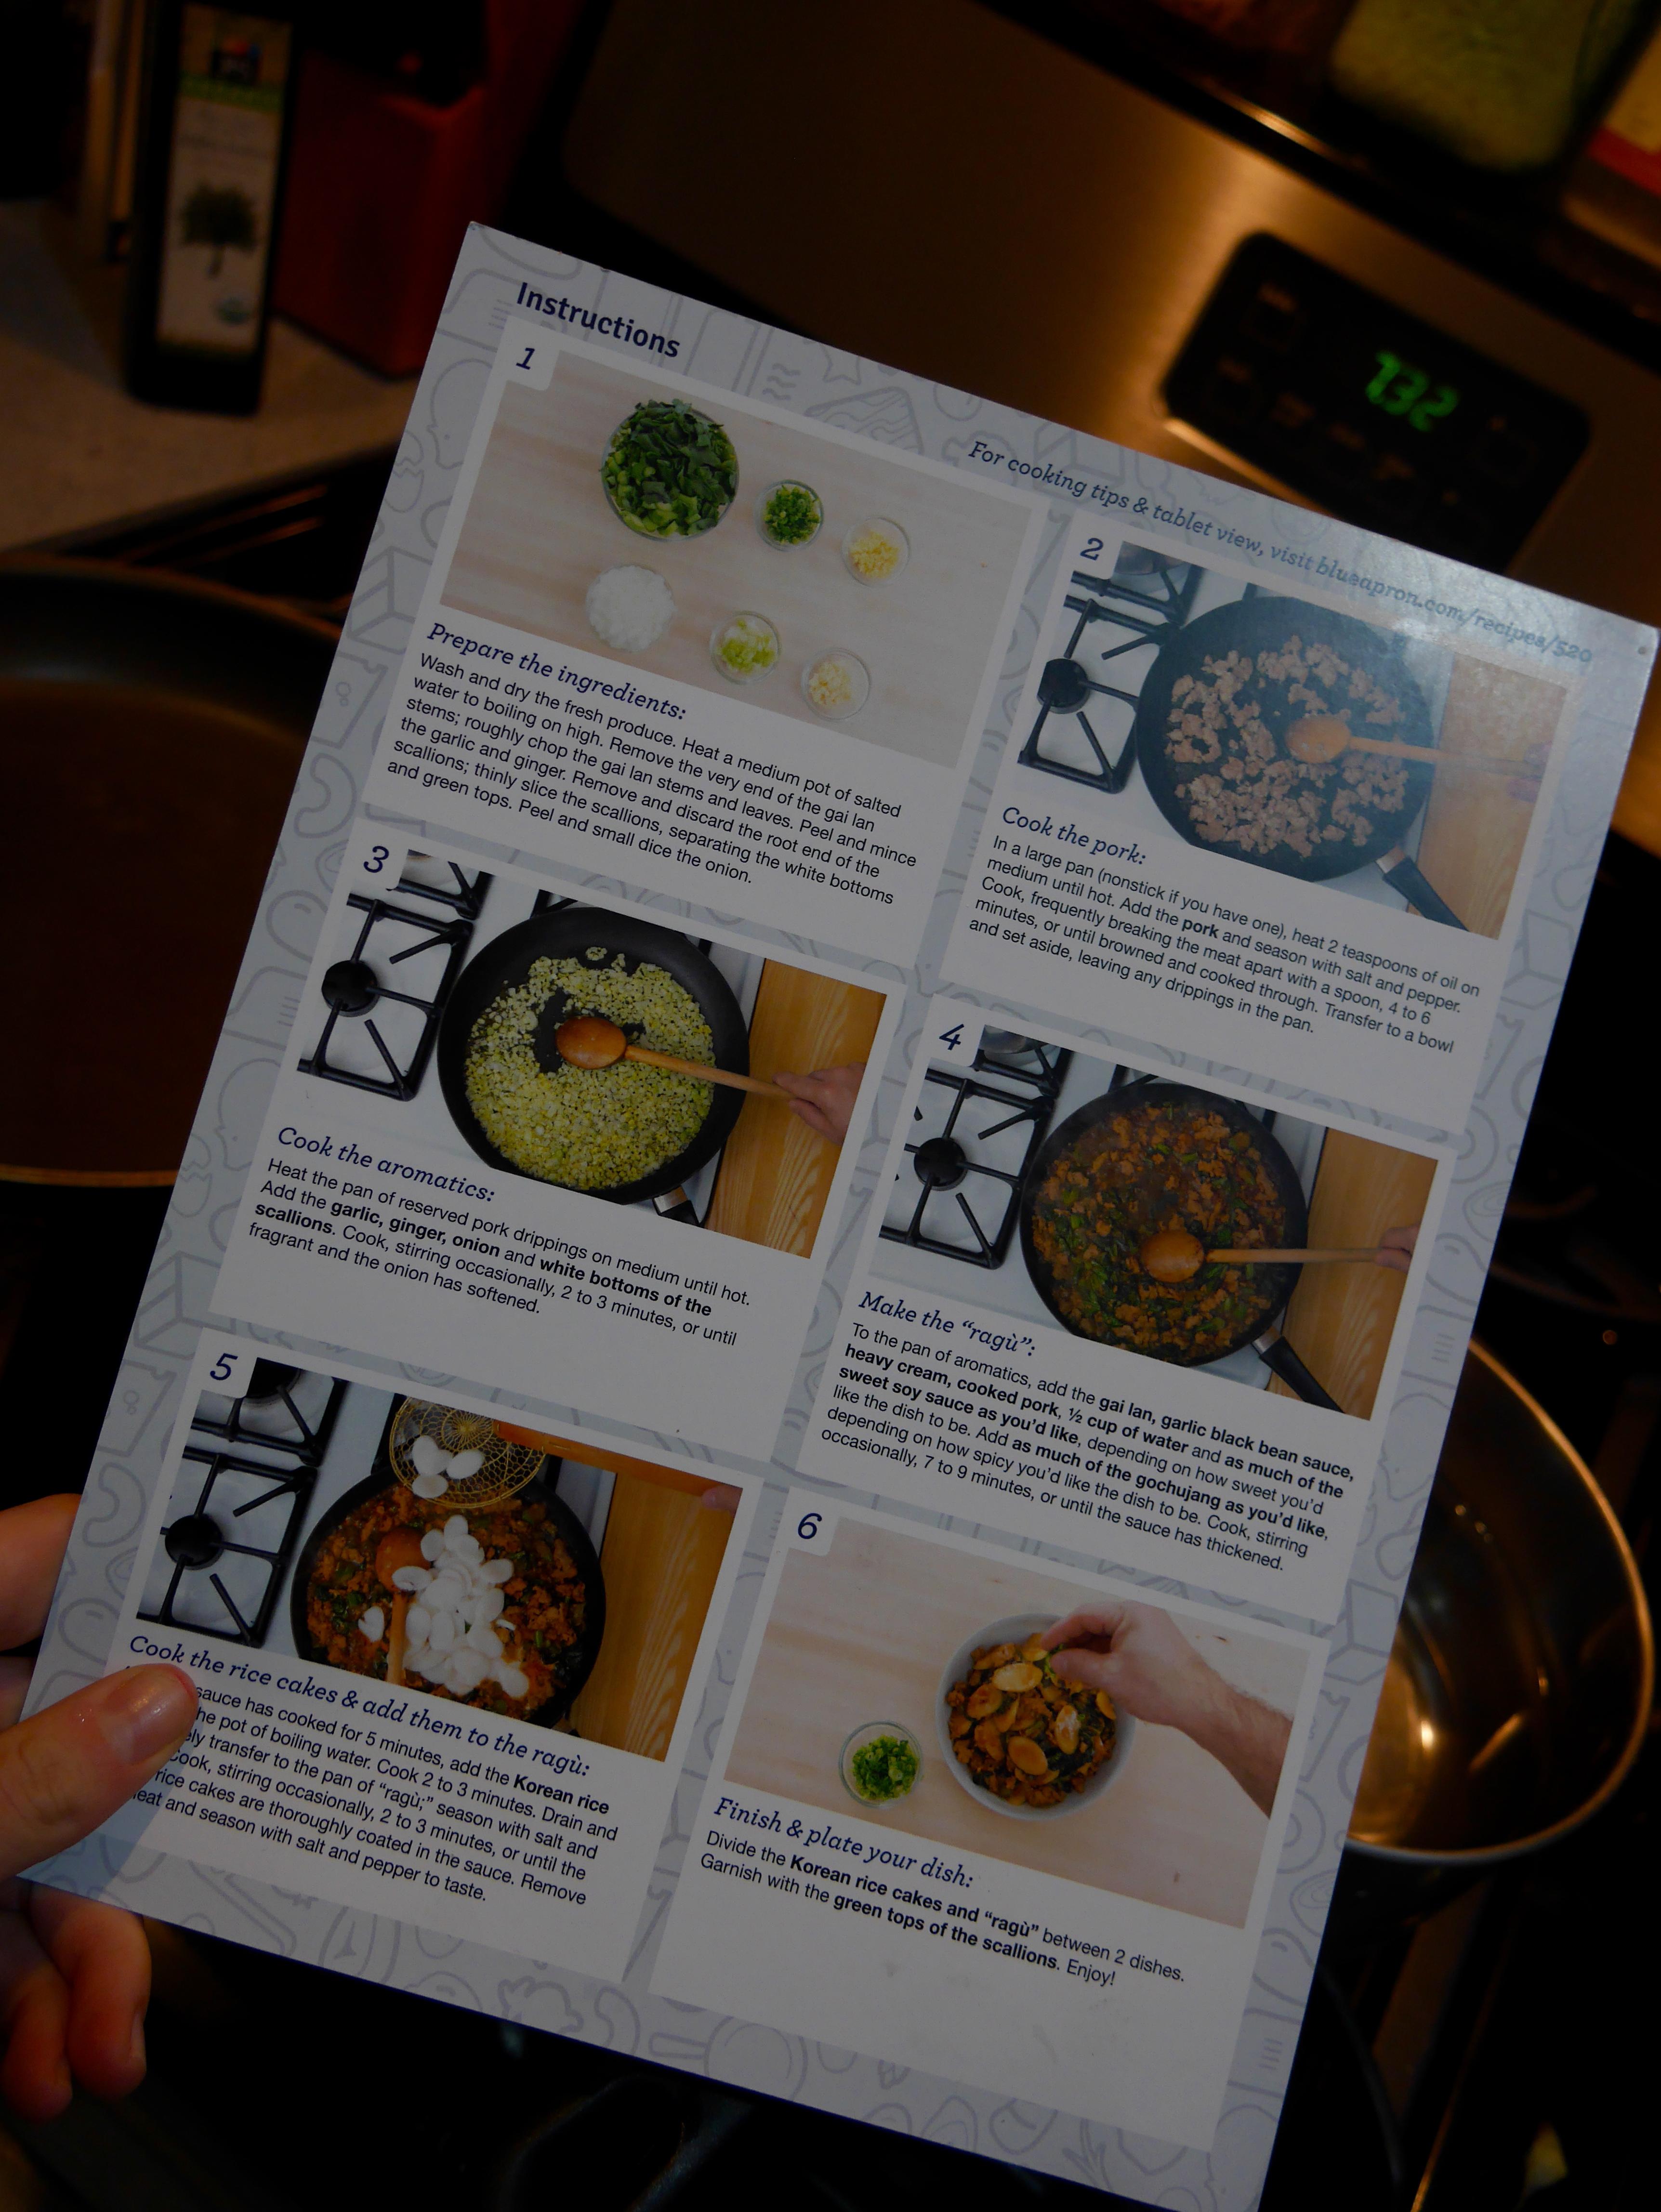 Blue apron korean rice cakes - Instructions Blue Apron